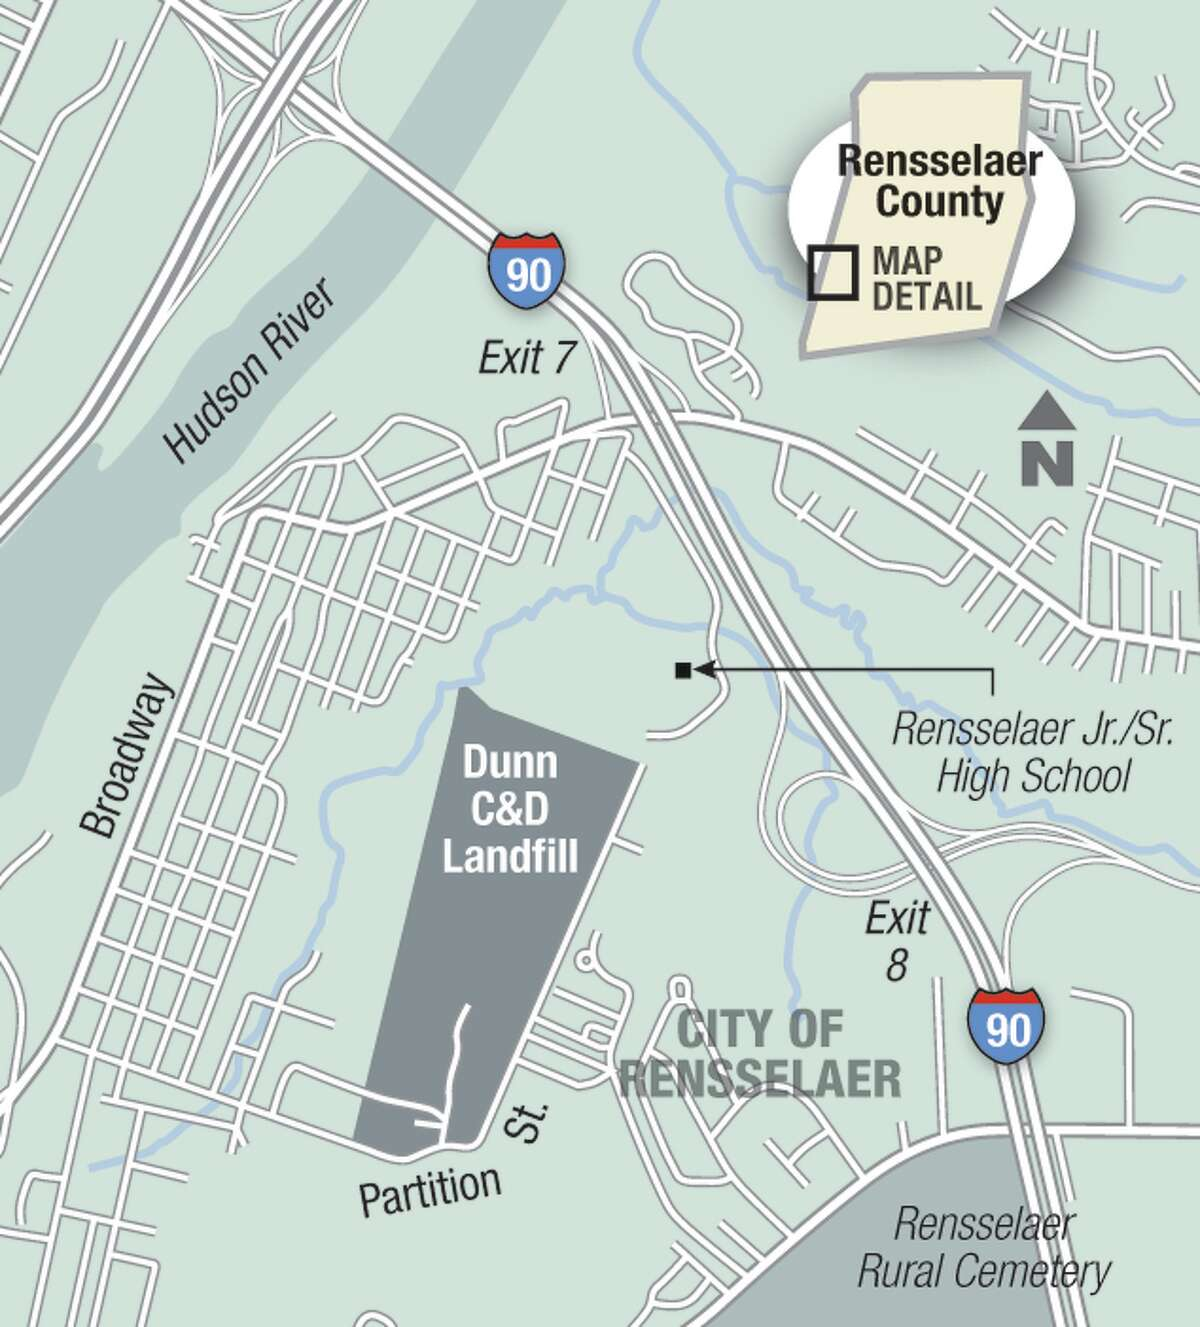 Location of the Dunn construction and demolition debris landfill next to the Rensselaer Junior-Senior High School.